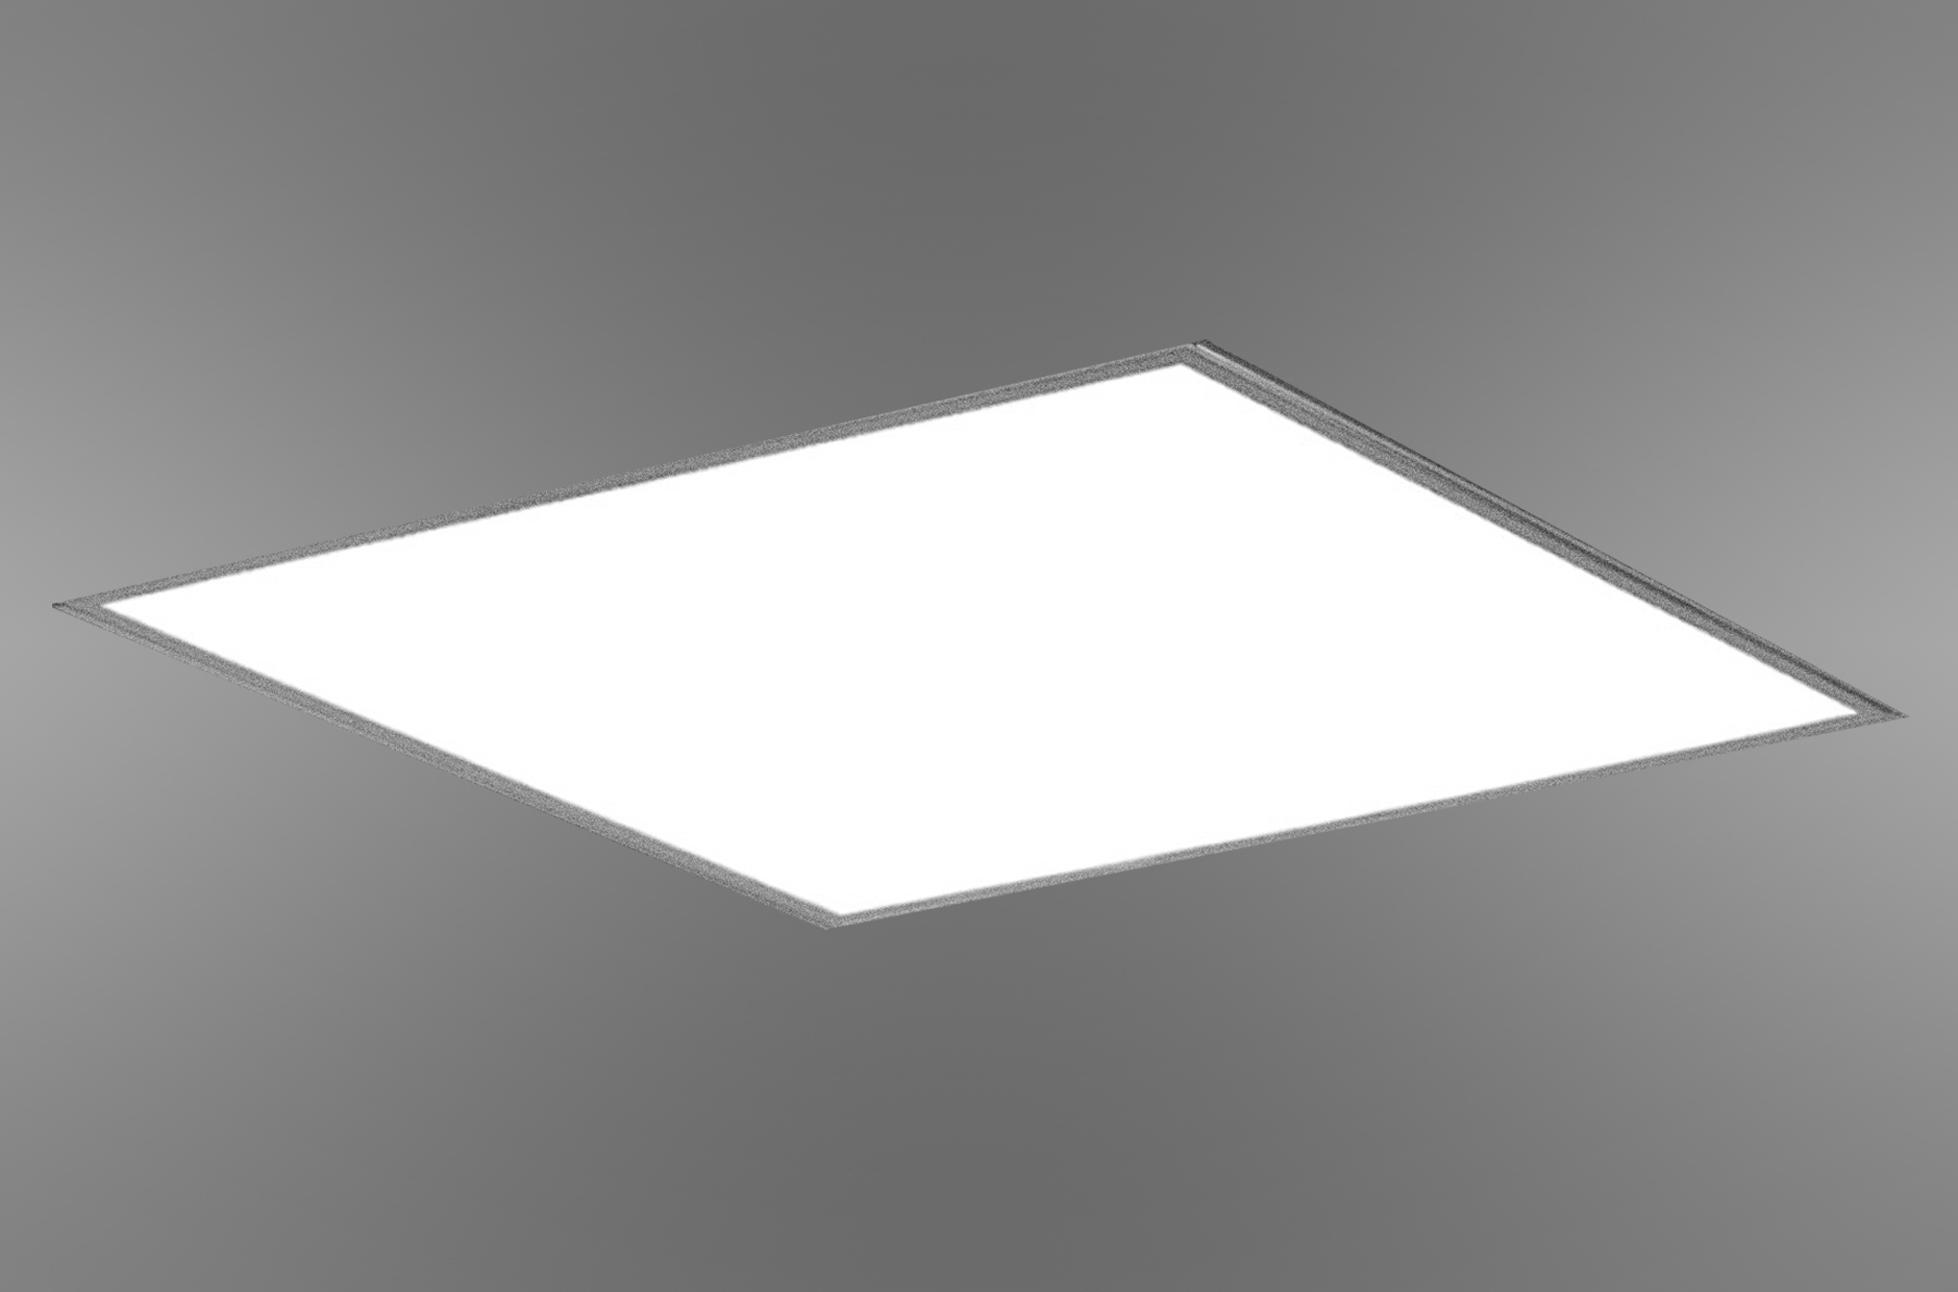 Veil - Recessed grid | Soft volumetric, direct illumination